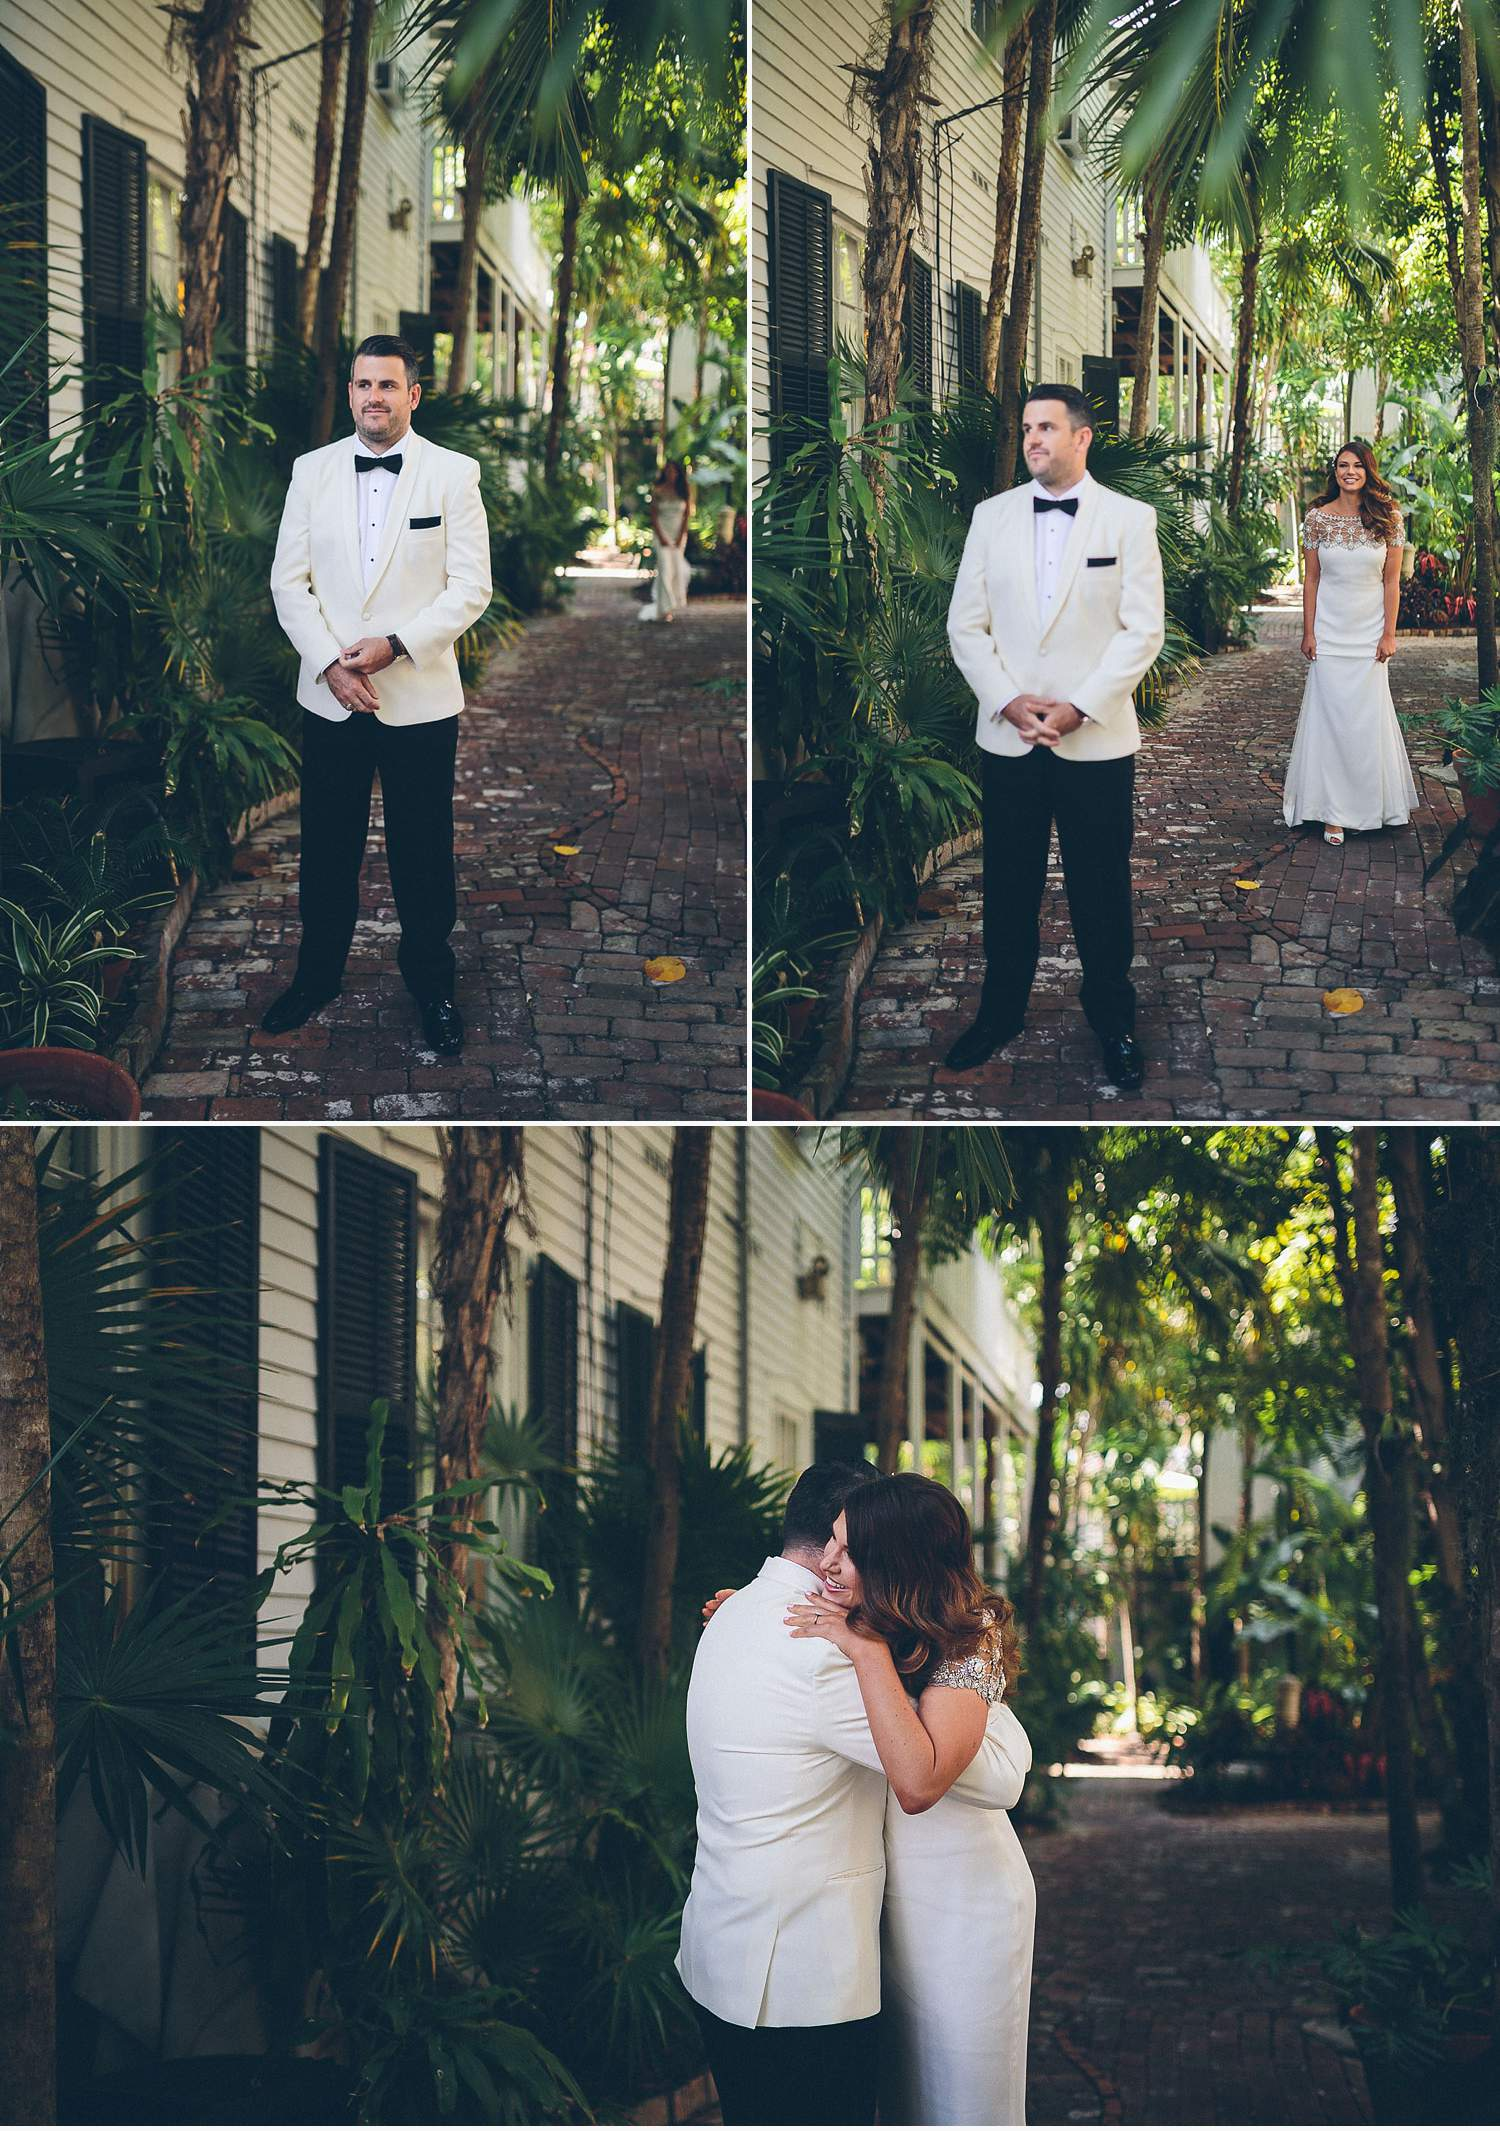 audubon-house-key-west-wedding-photographer-daniel-lateulade-0006.JPG